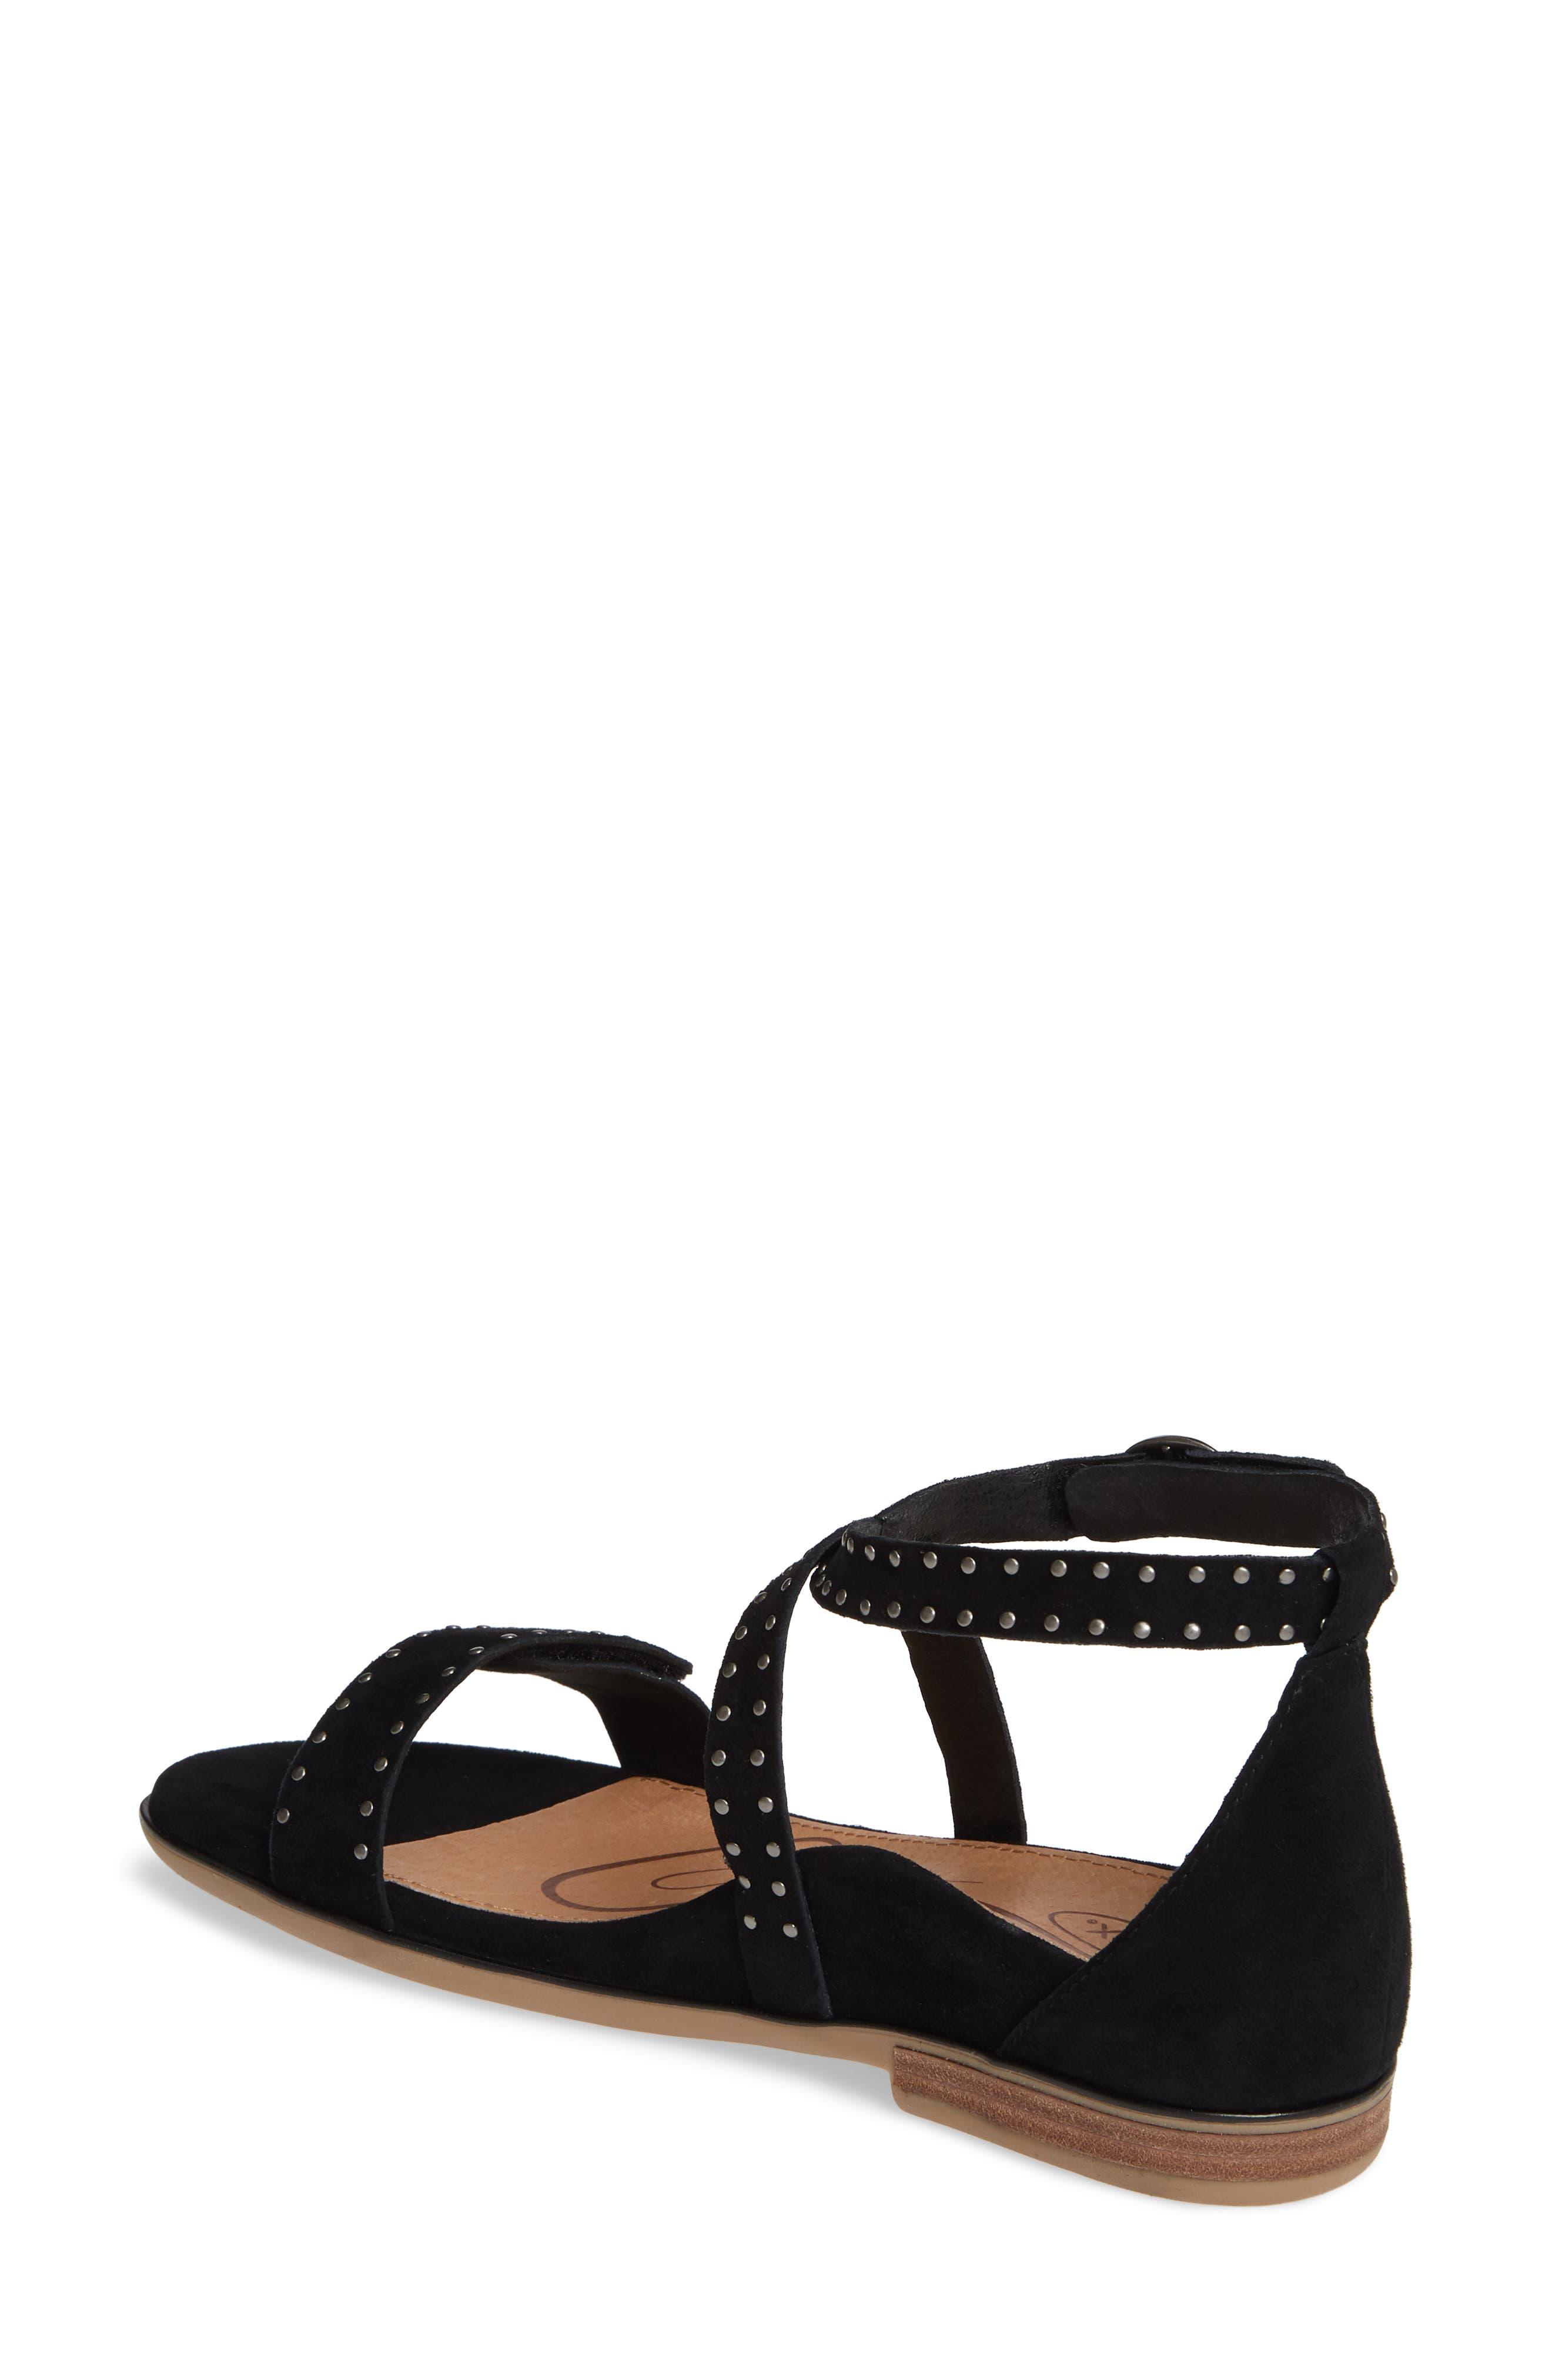 AETREX, Hailey Studded Sandal, Alternate thumbnail 2, color, BLACK SUEDE